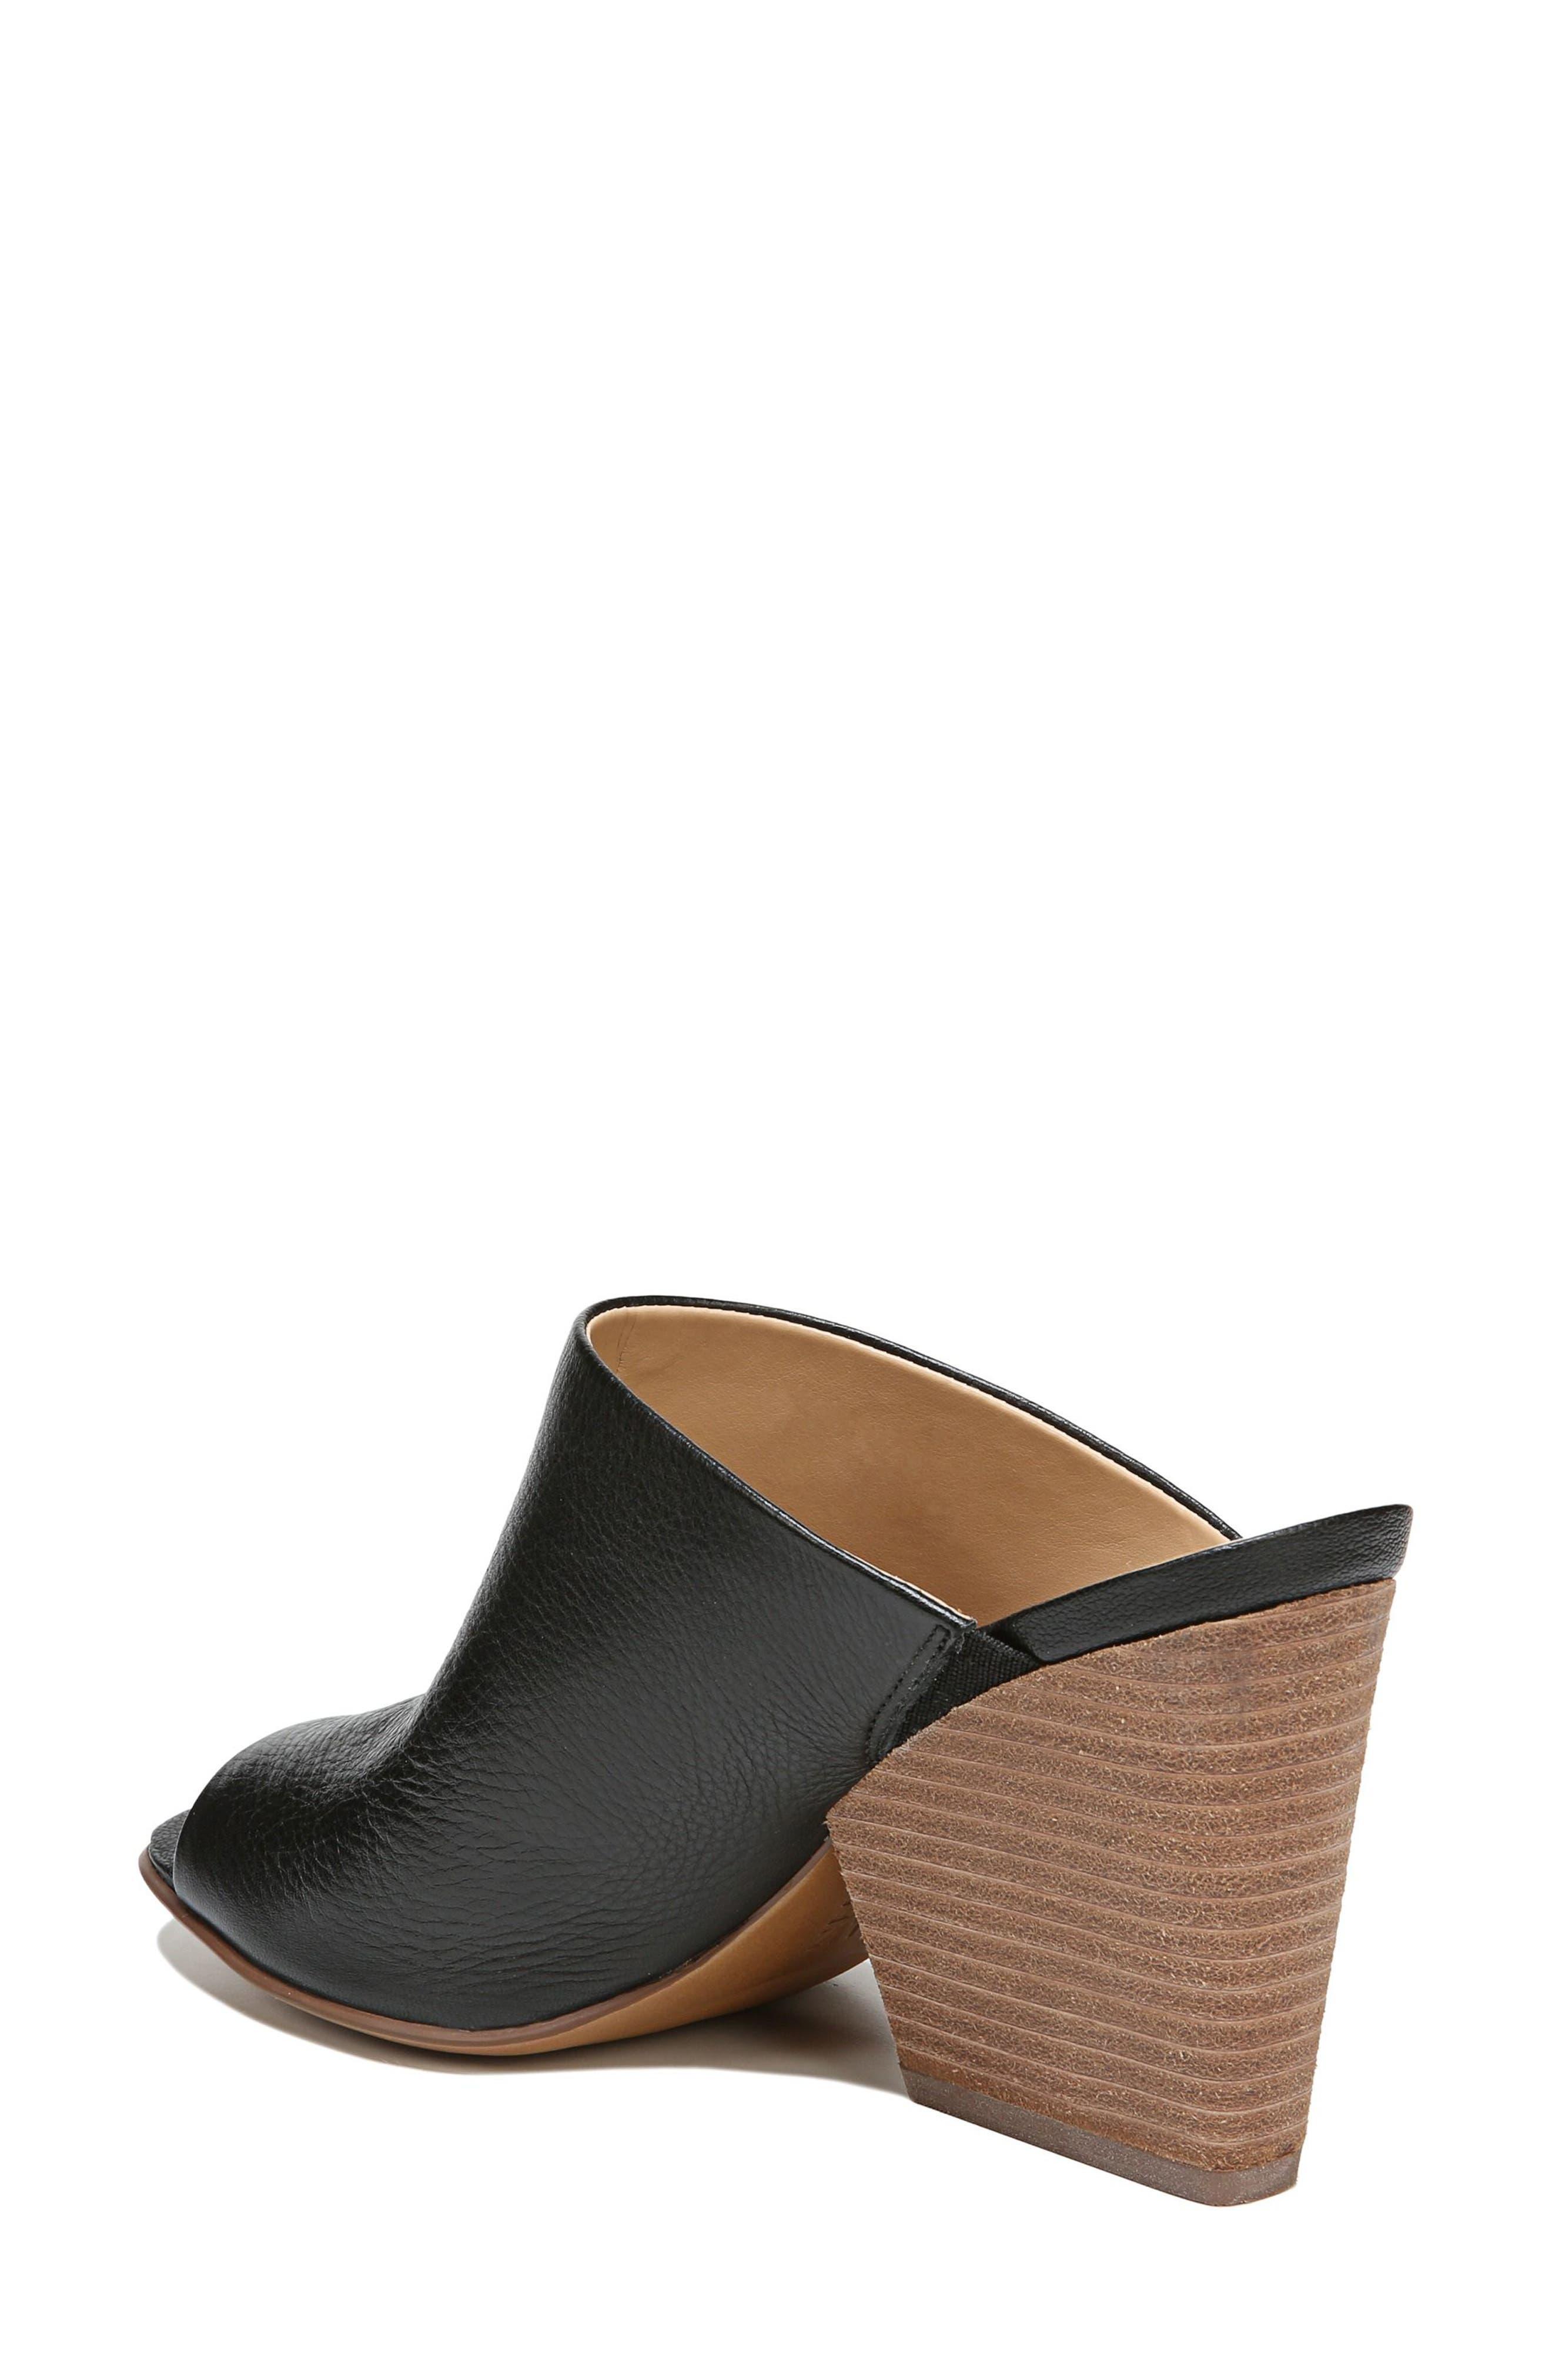 Sloan Sandal,                             Alternate thumbnail 2, color,                             Black Pebbled Leather